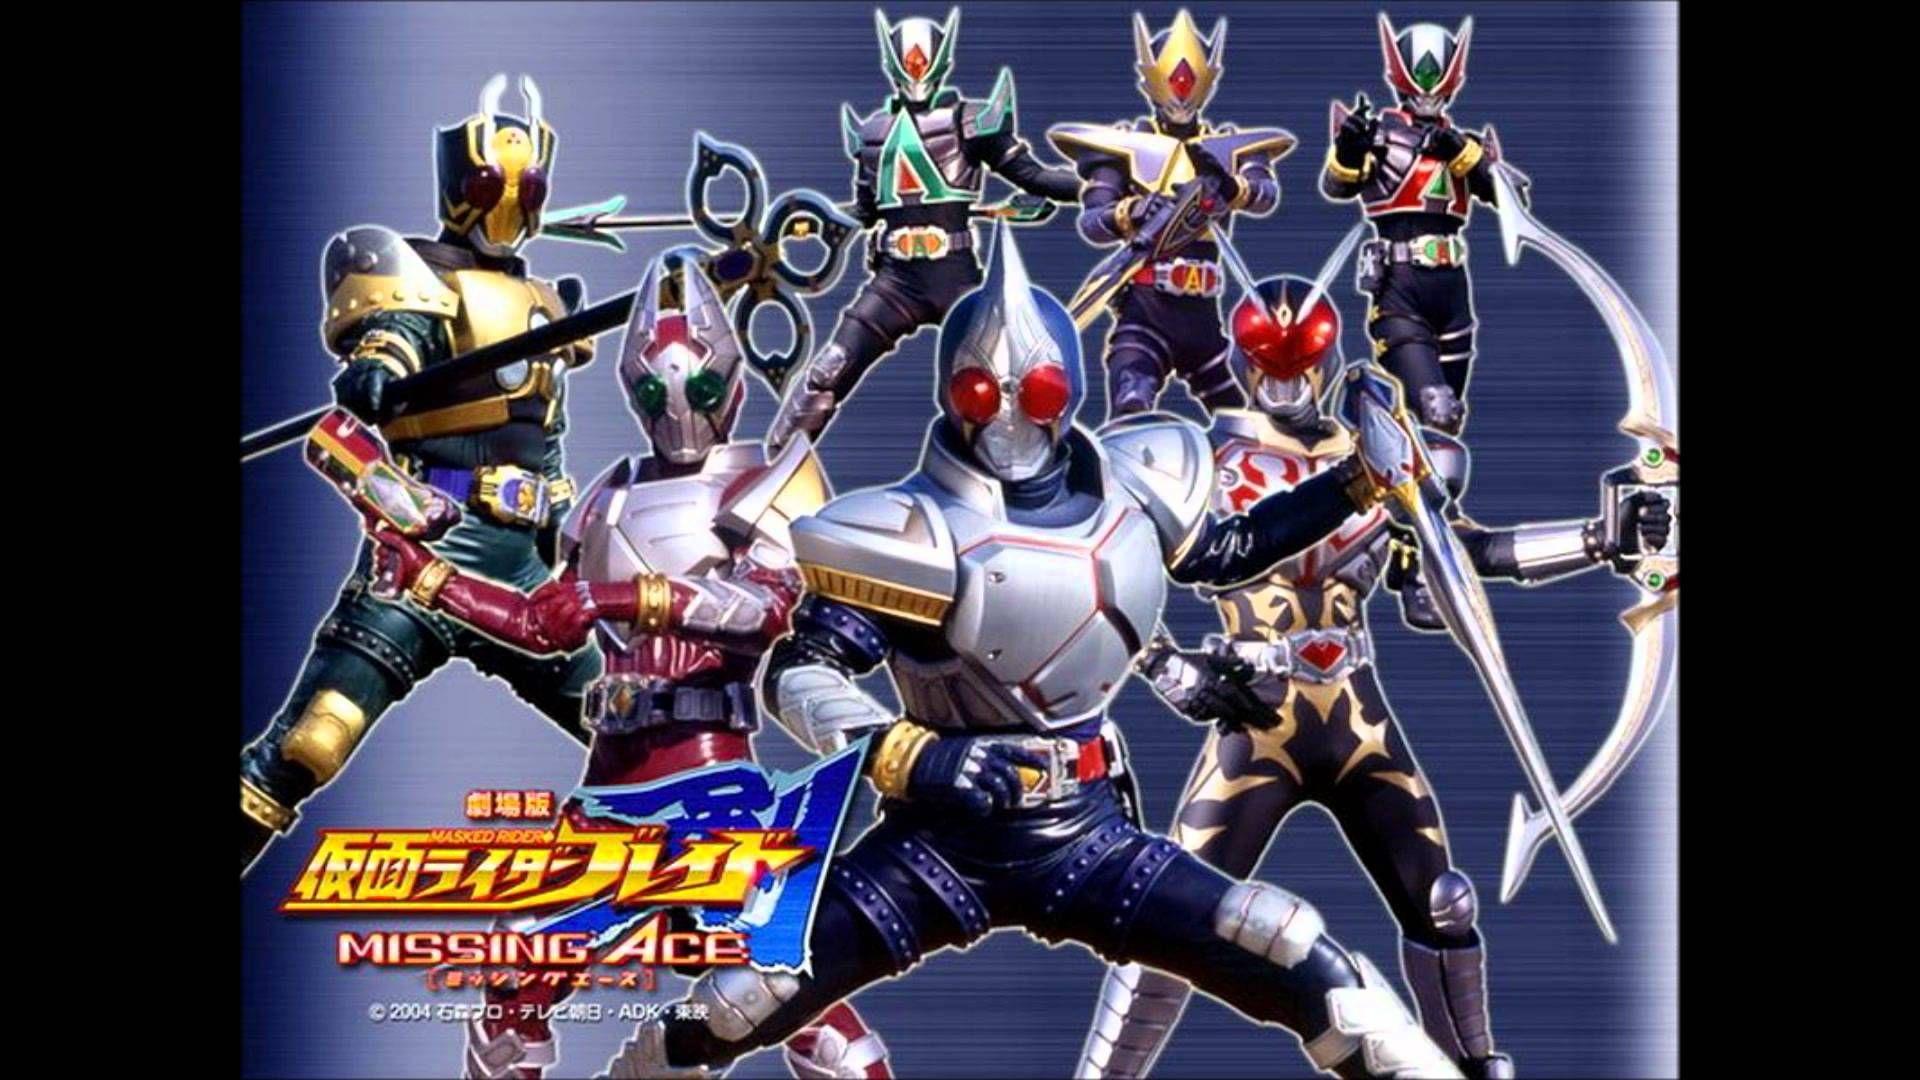 Kamen Rider Blade Ending 3 Take It A Try Kamen Rider Kamen Rider Series Rider